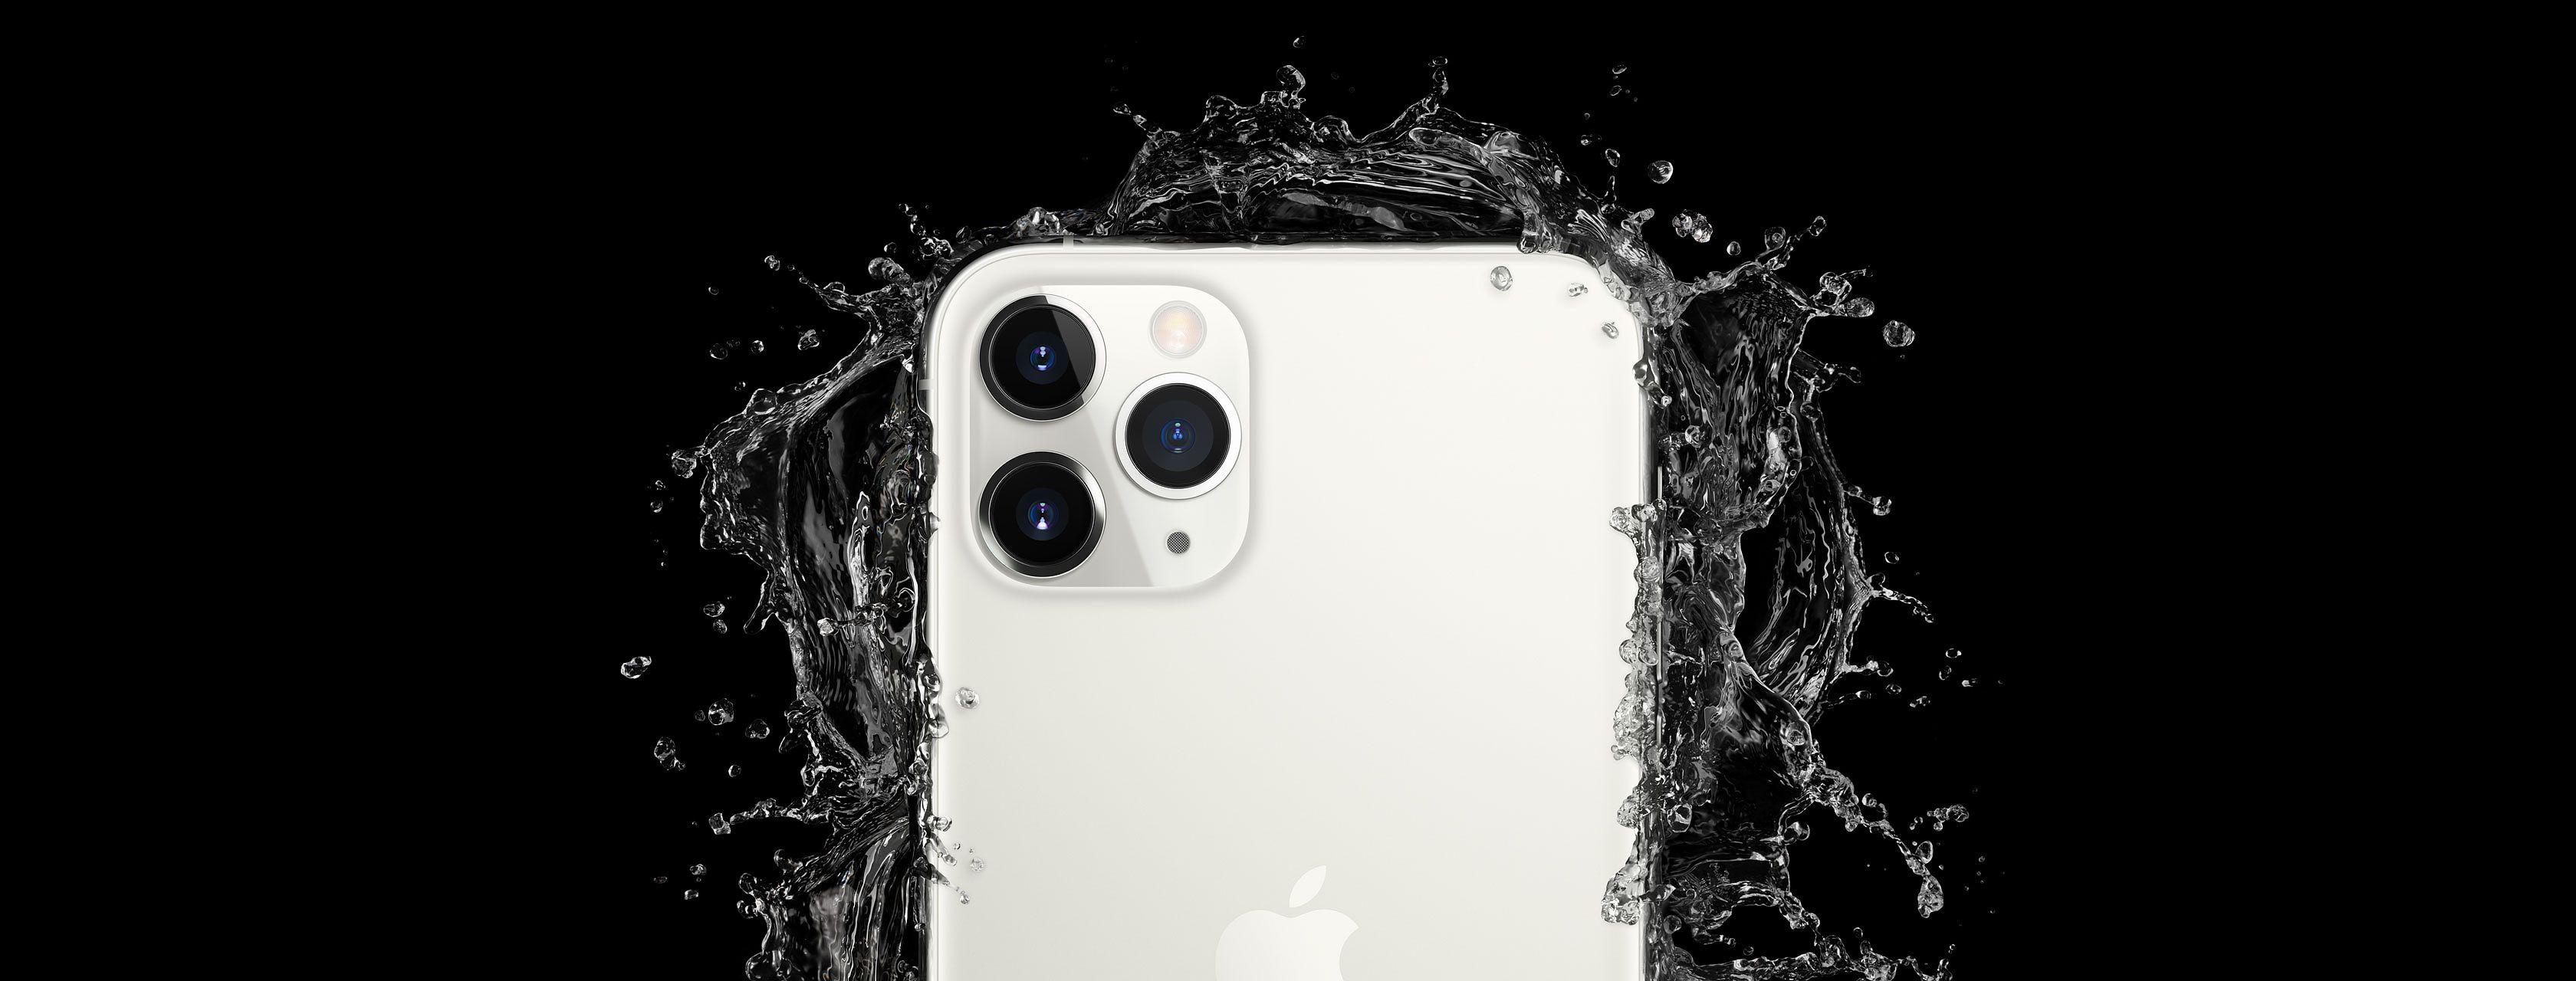 iPhone 11 Pro resistente al agua